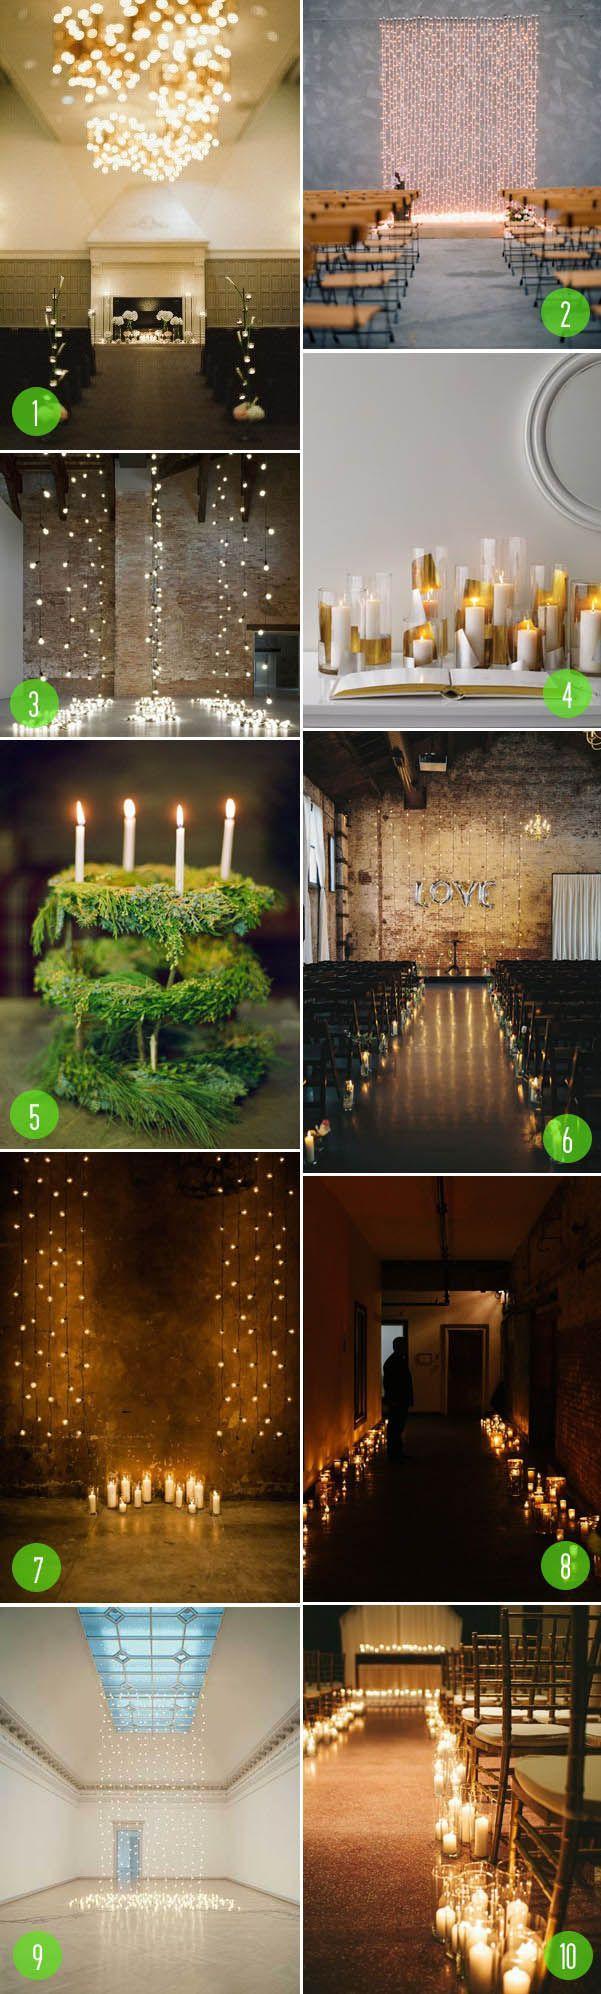 Hochzeit - Top 10: Dramatic Lighting